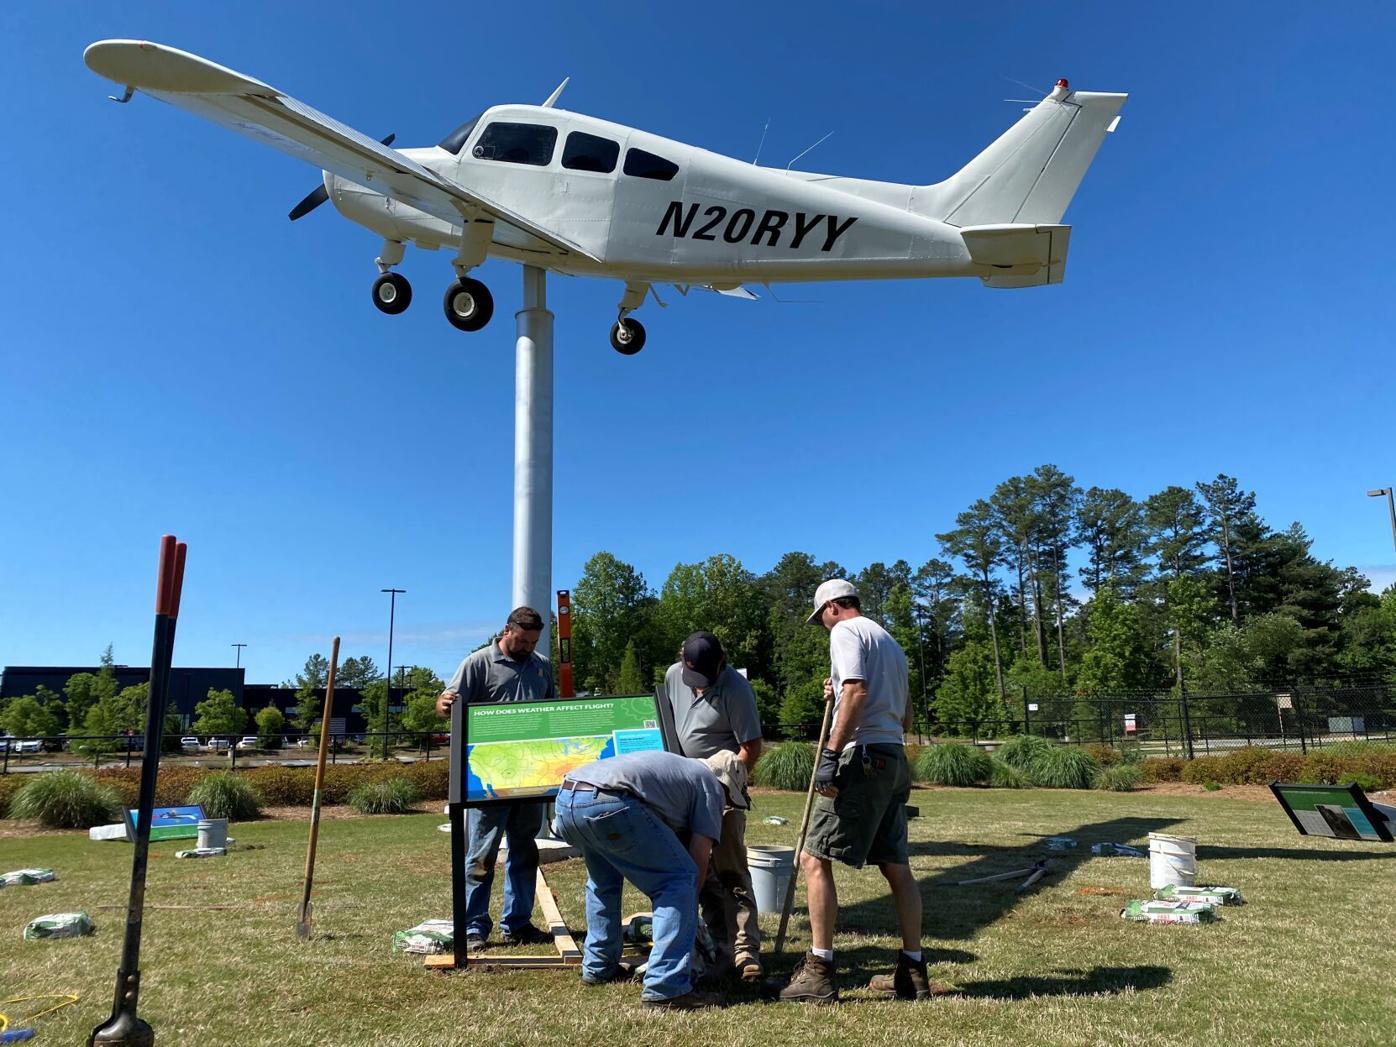 052621_MDJ_Community_AviationParkExhibit1_InstallationBegins.jpg